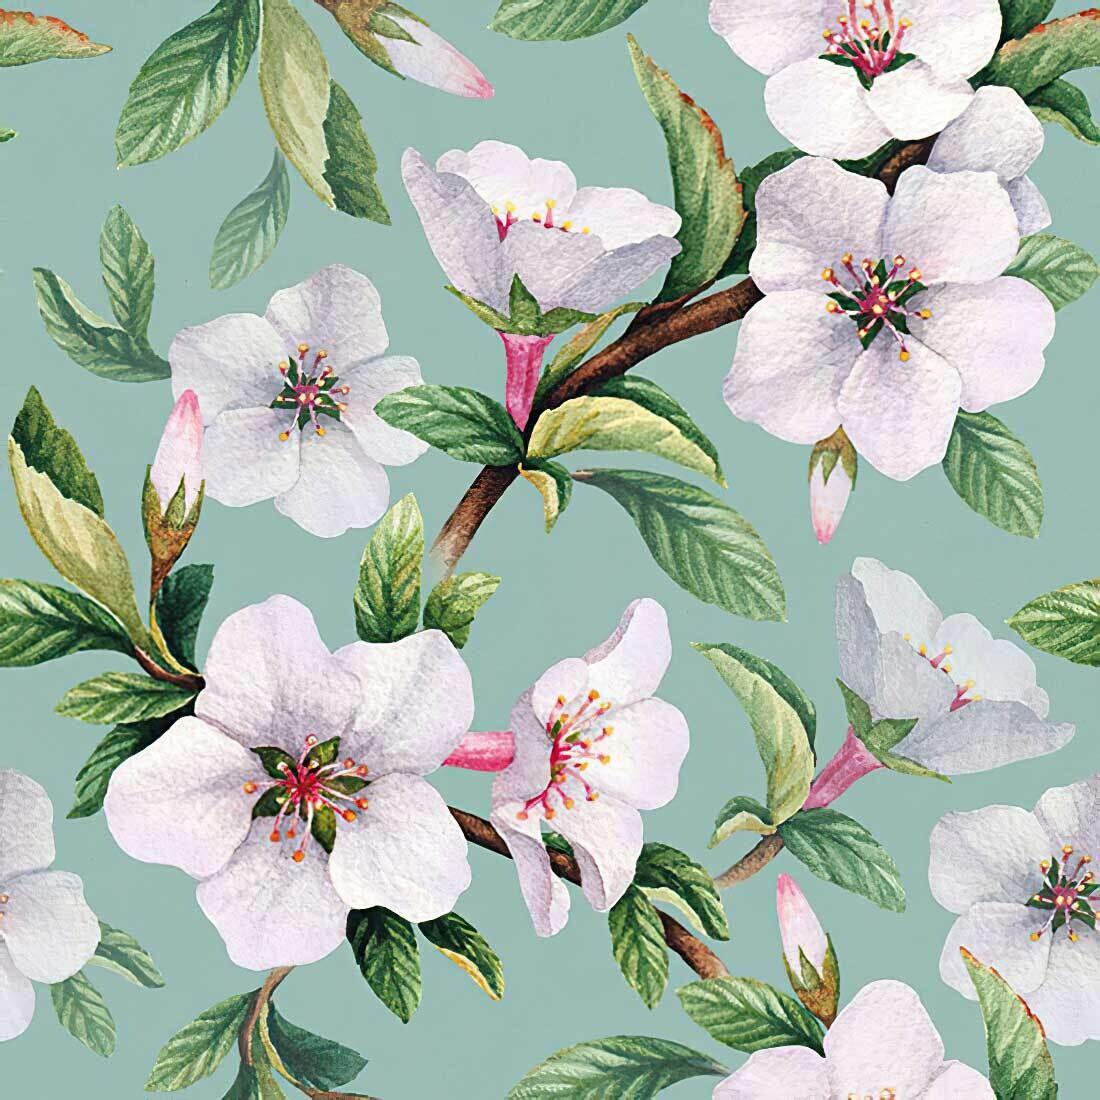 Decoupage Paper Napkins - Floral - Fleur Green (1 Sheet)